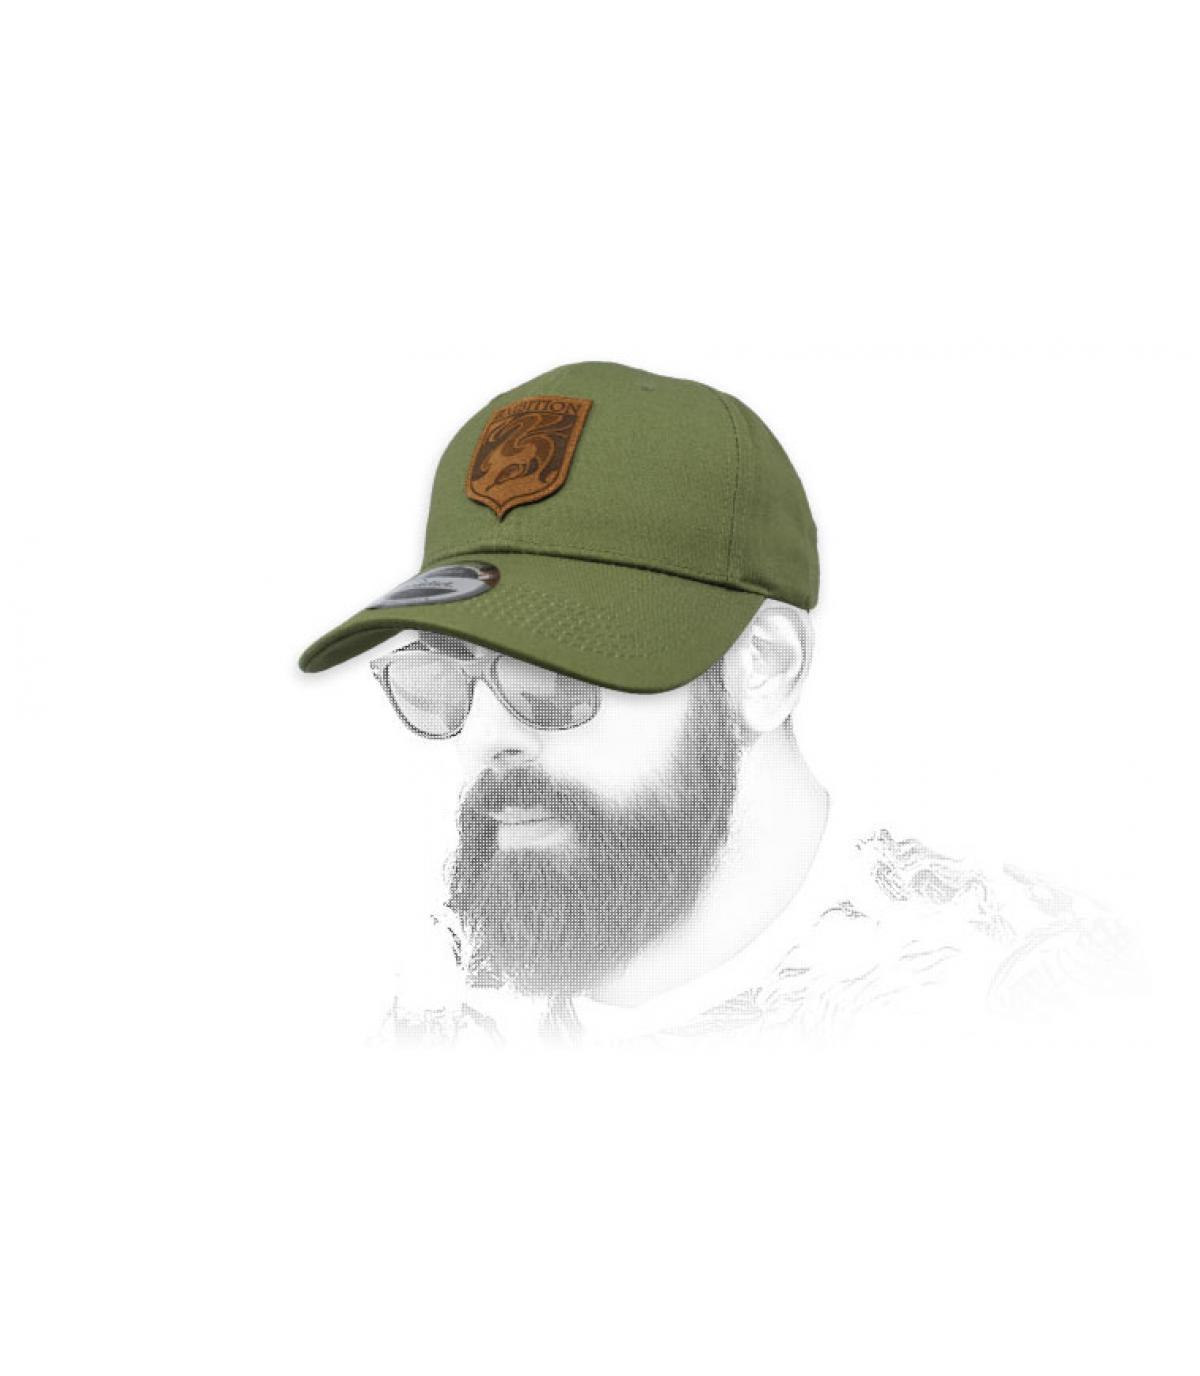 Cappello verde ambition